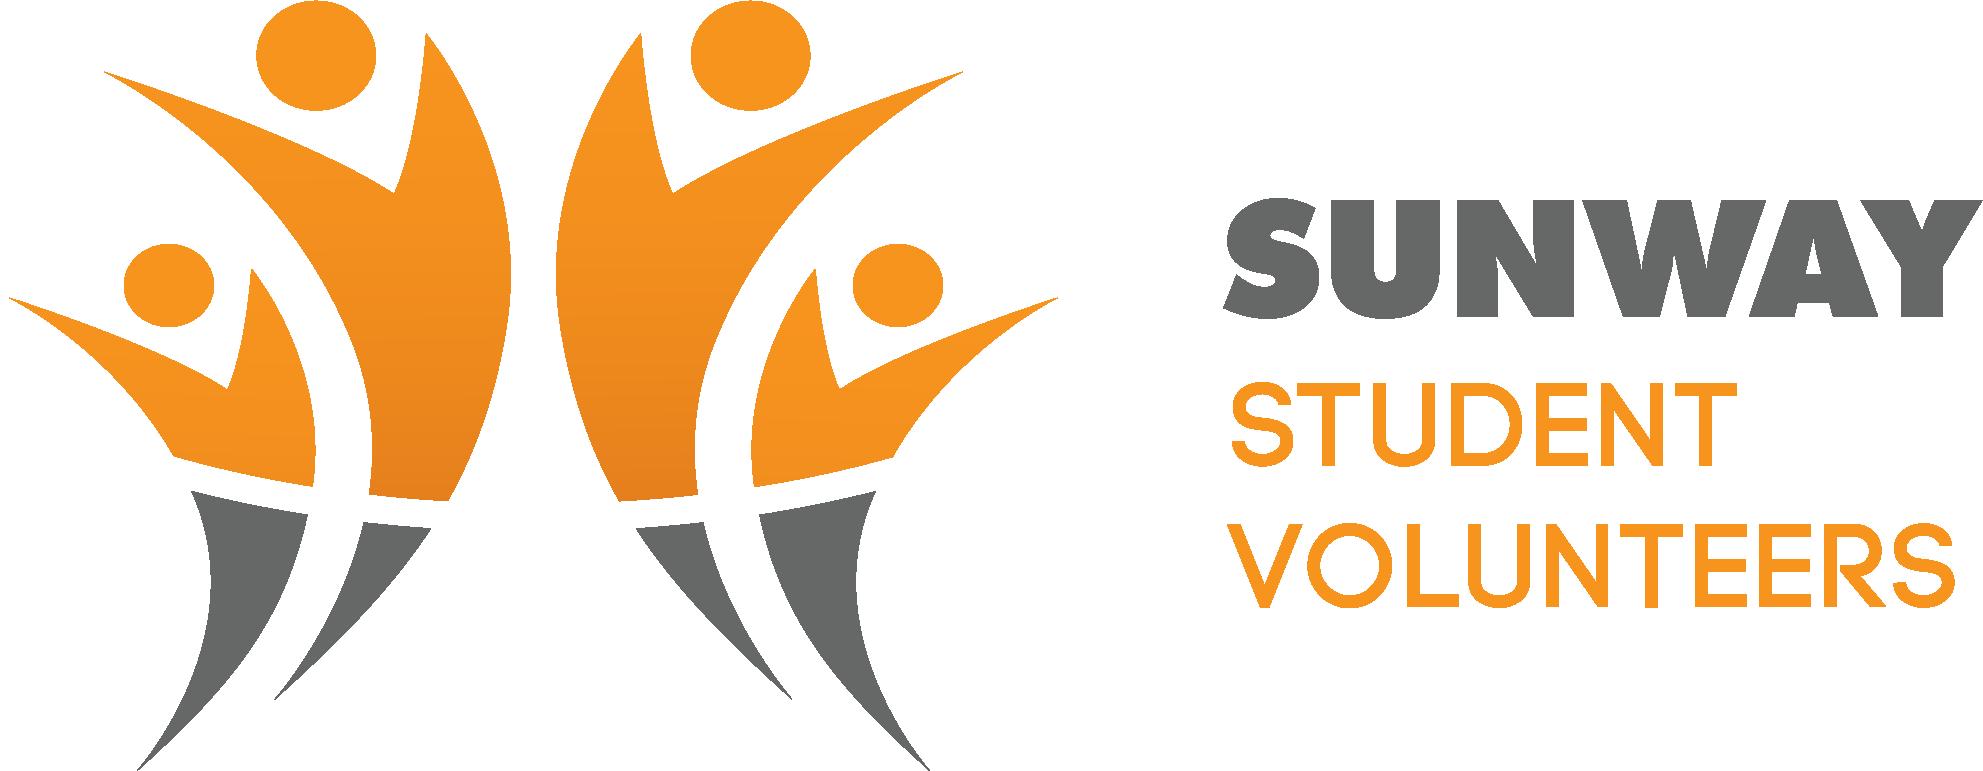 Sunway Student Volunteers